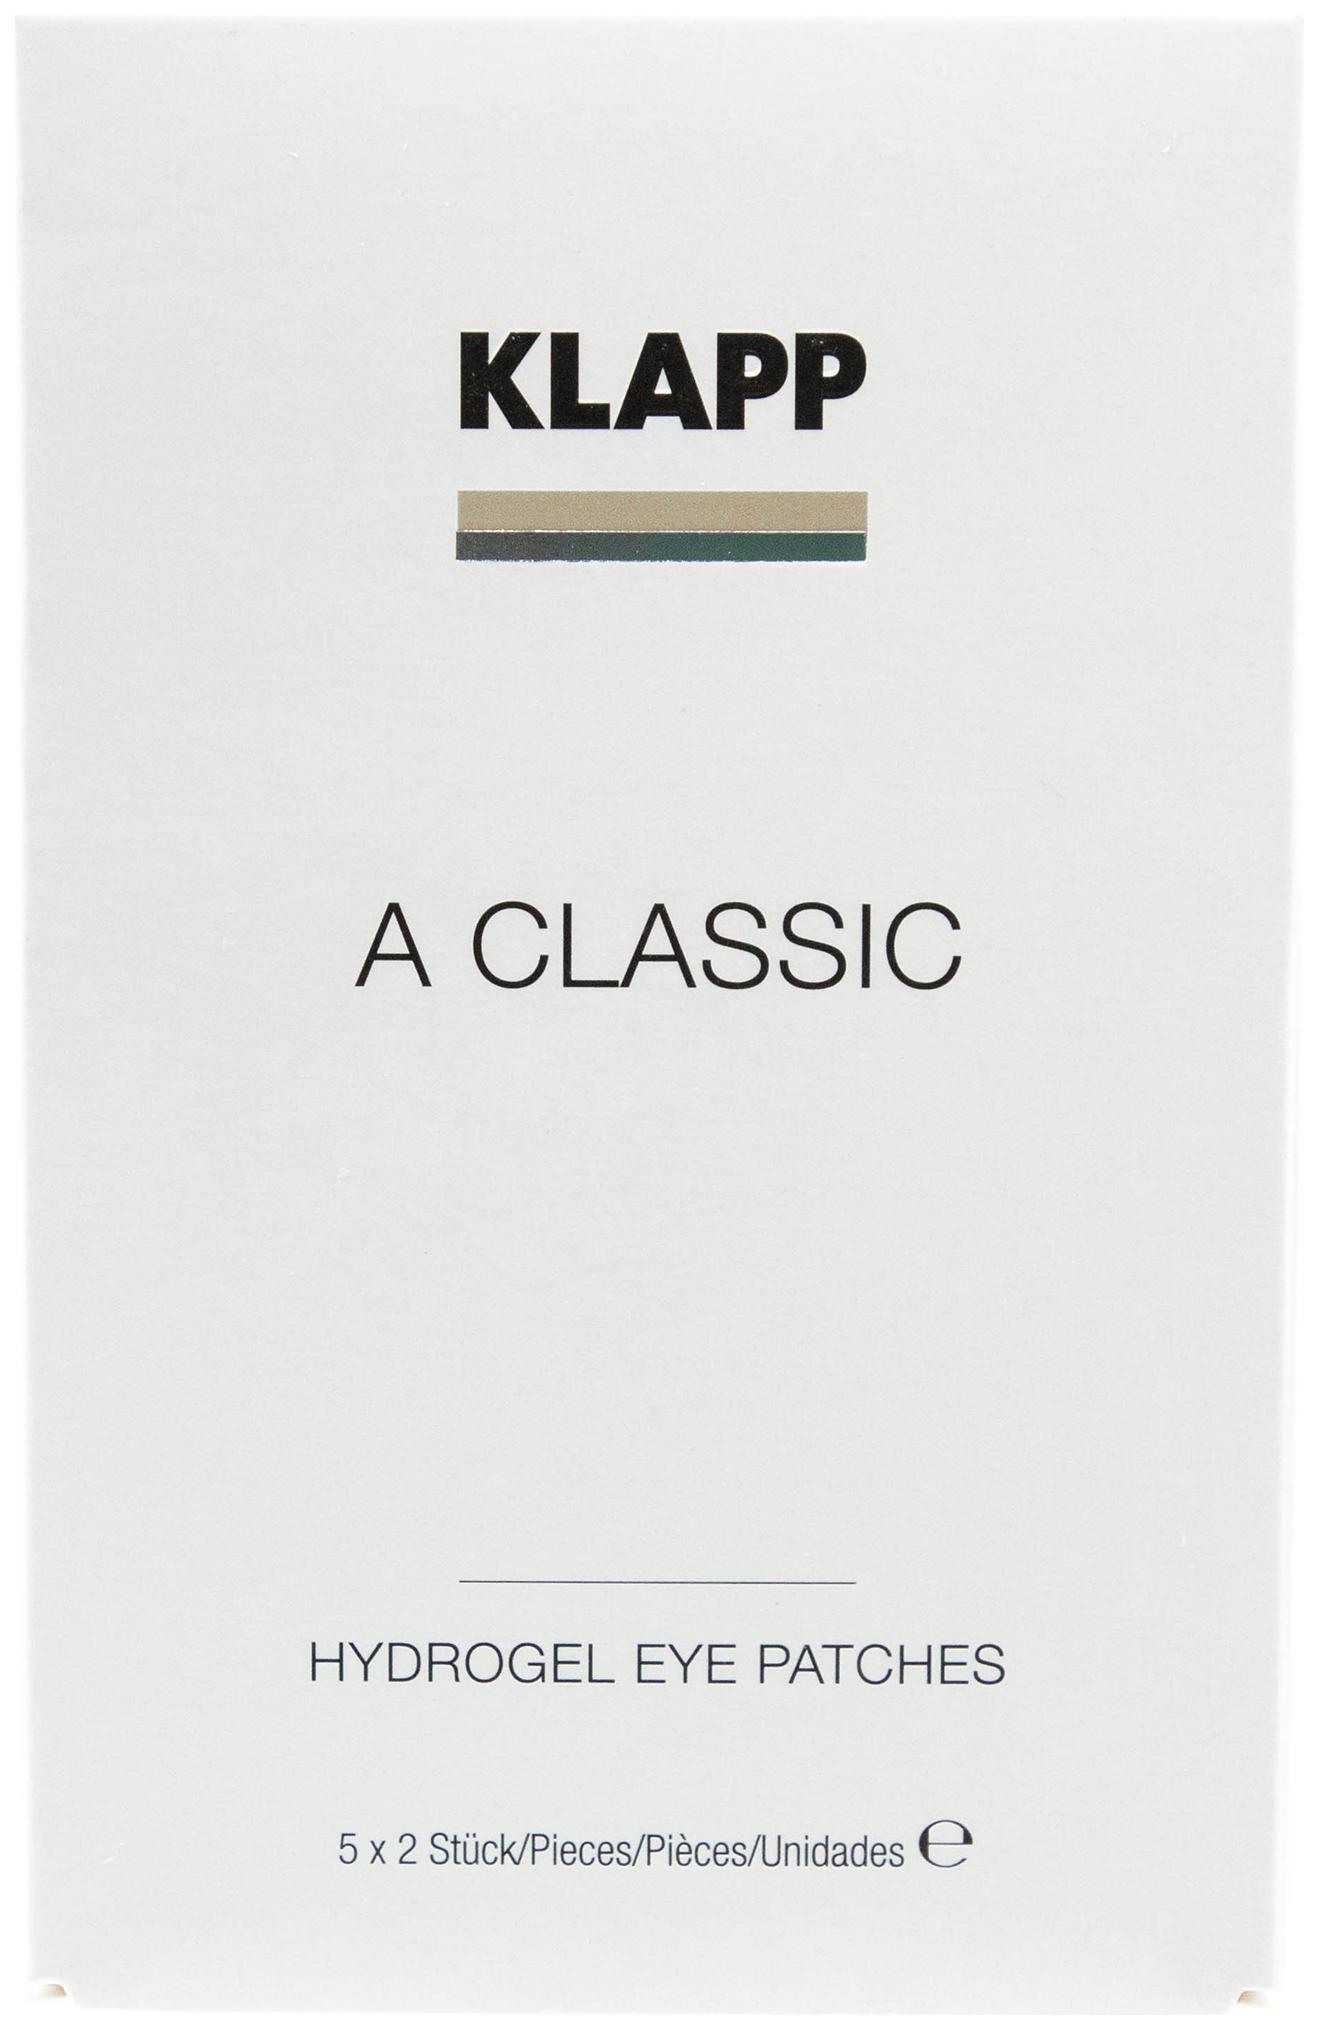 Маска для глаз Klapp A Classic Hydrogel